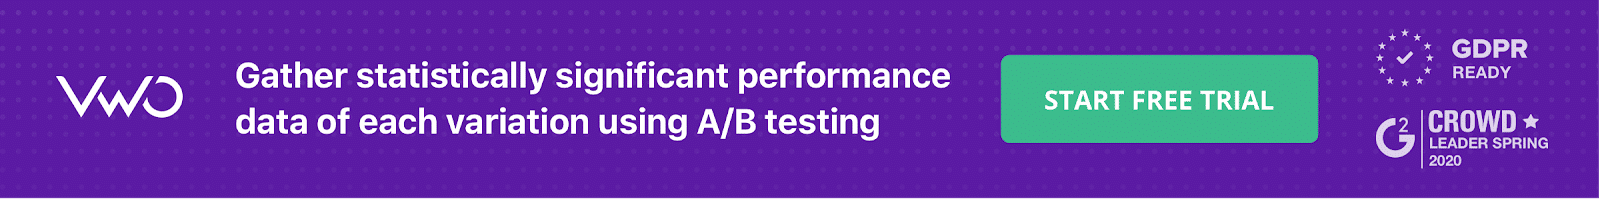 Mab Testing